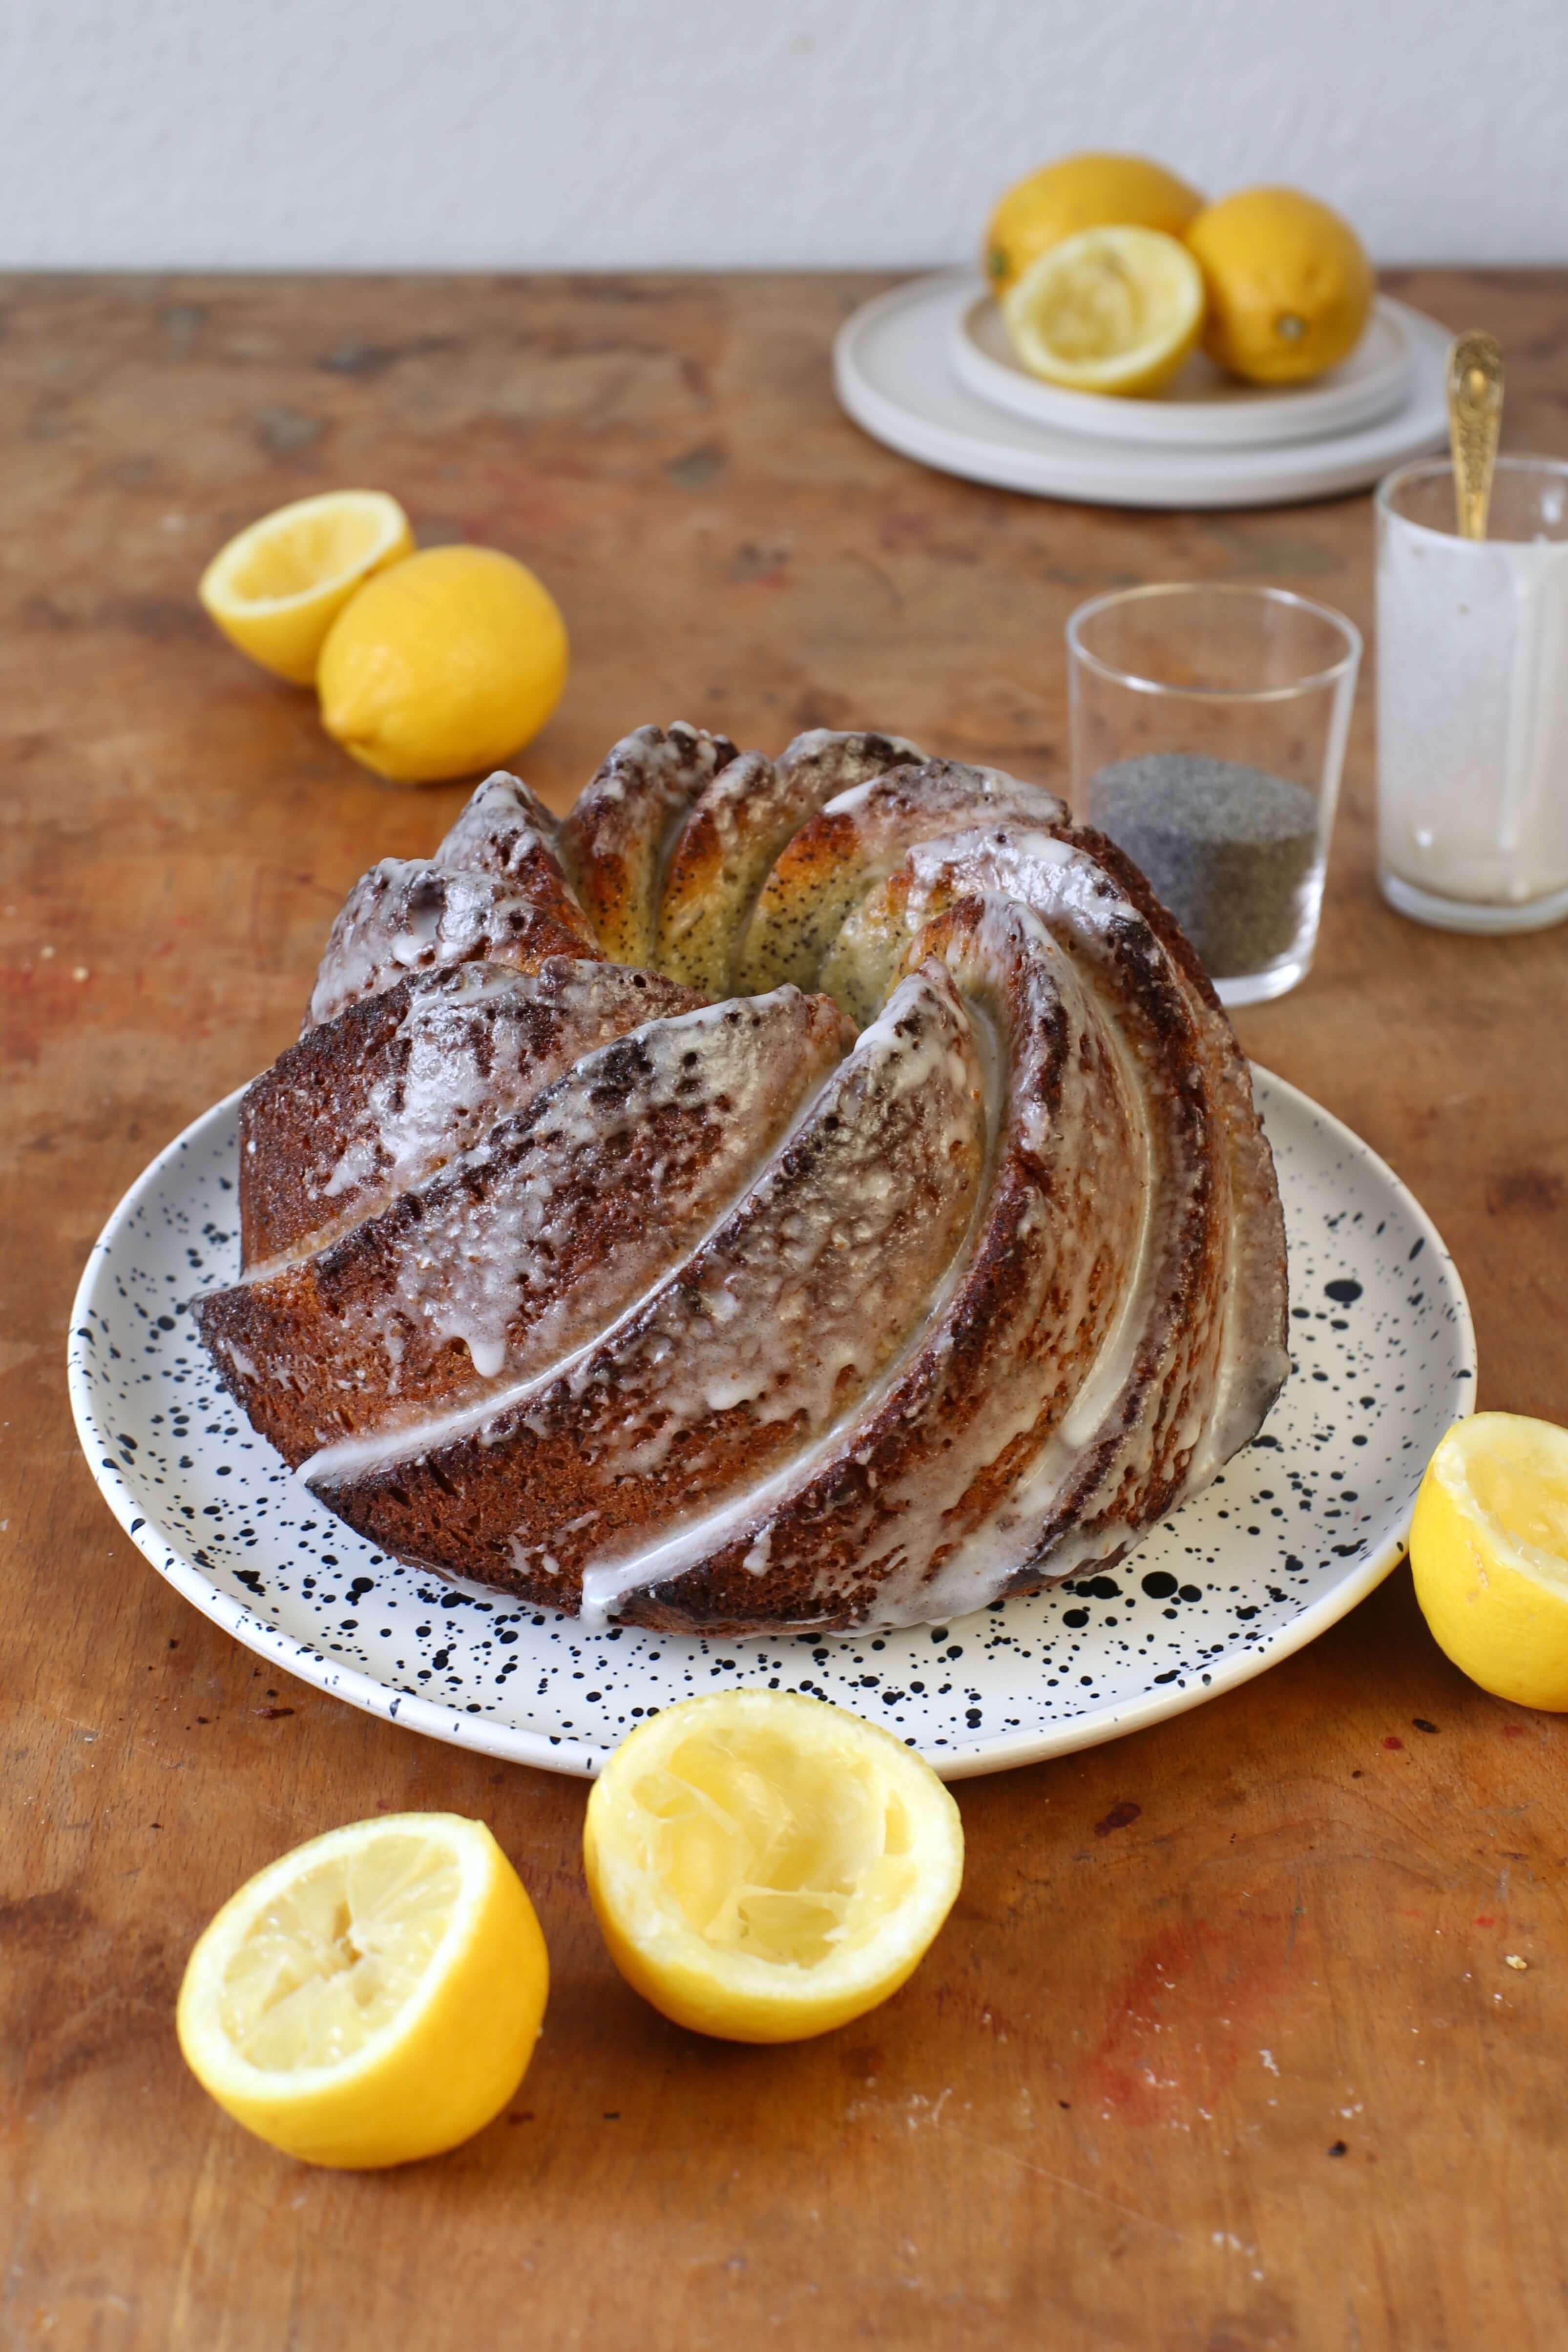 Saftiger und schneller Zitronen-Mohn-Gugelhupf. #laktosefrei   chilibluetendotcom